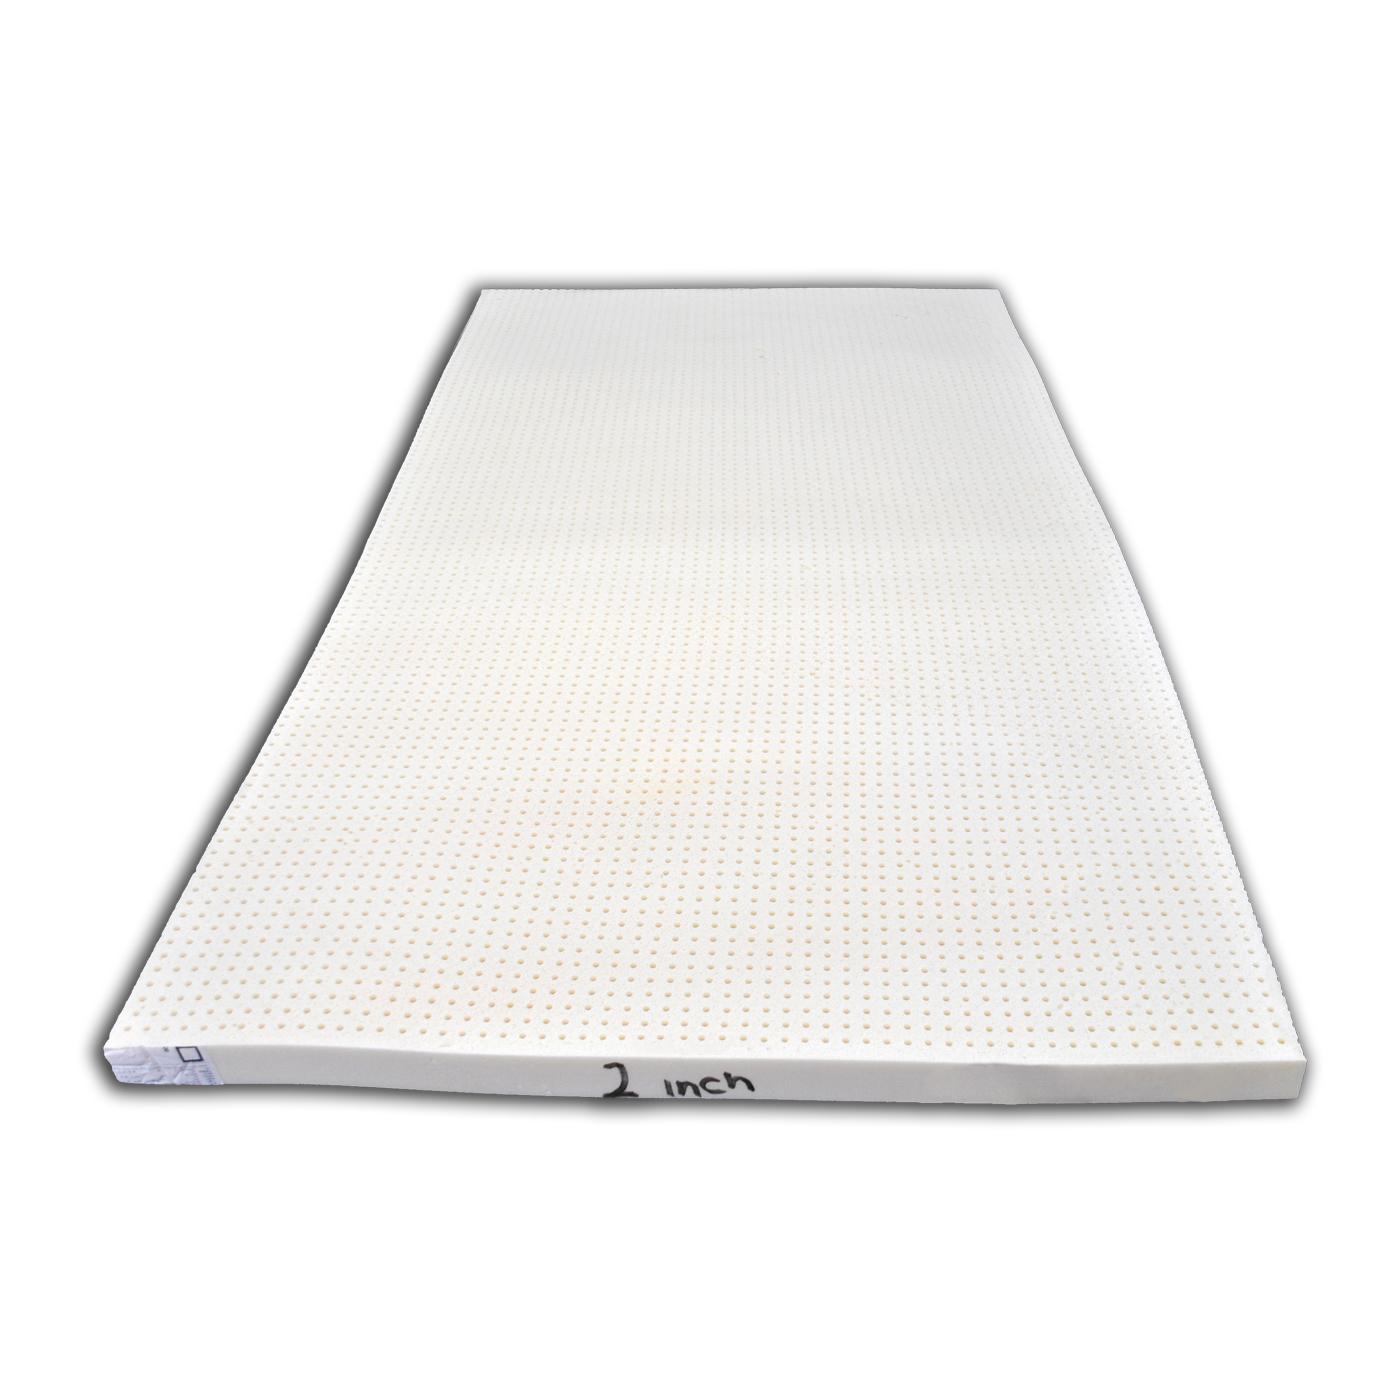 Best Latex Adjustable Bed